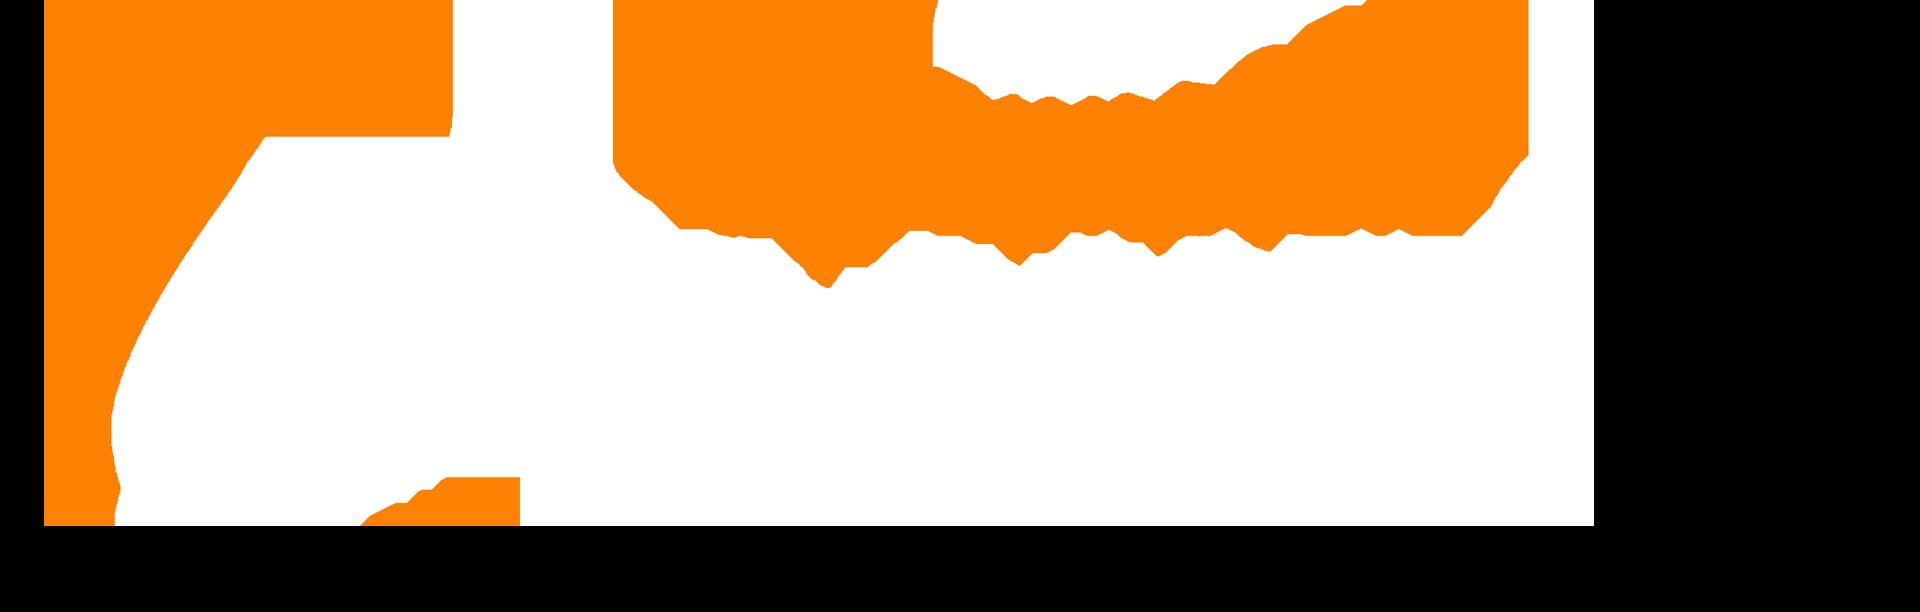 Copenhagen Flames - A Danish esports club with global ambitions!